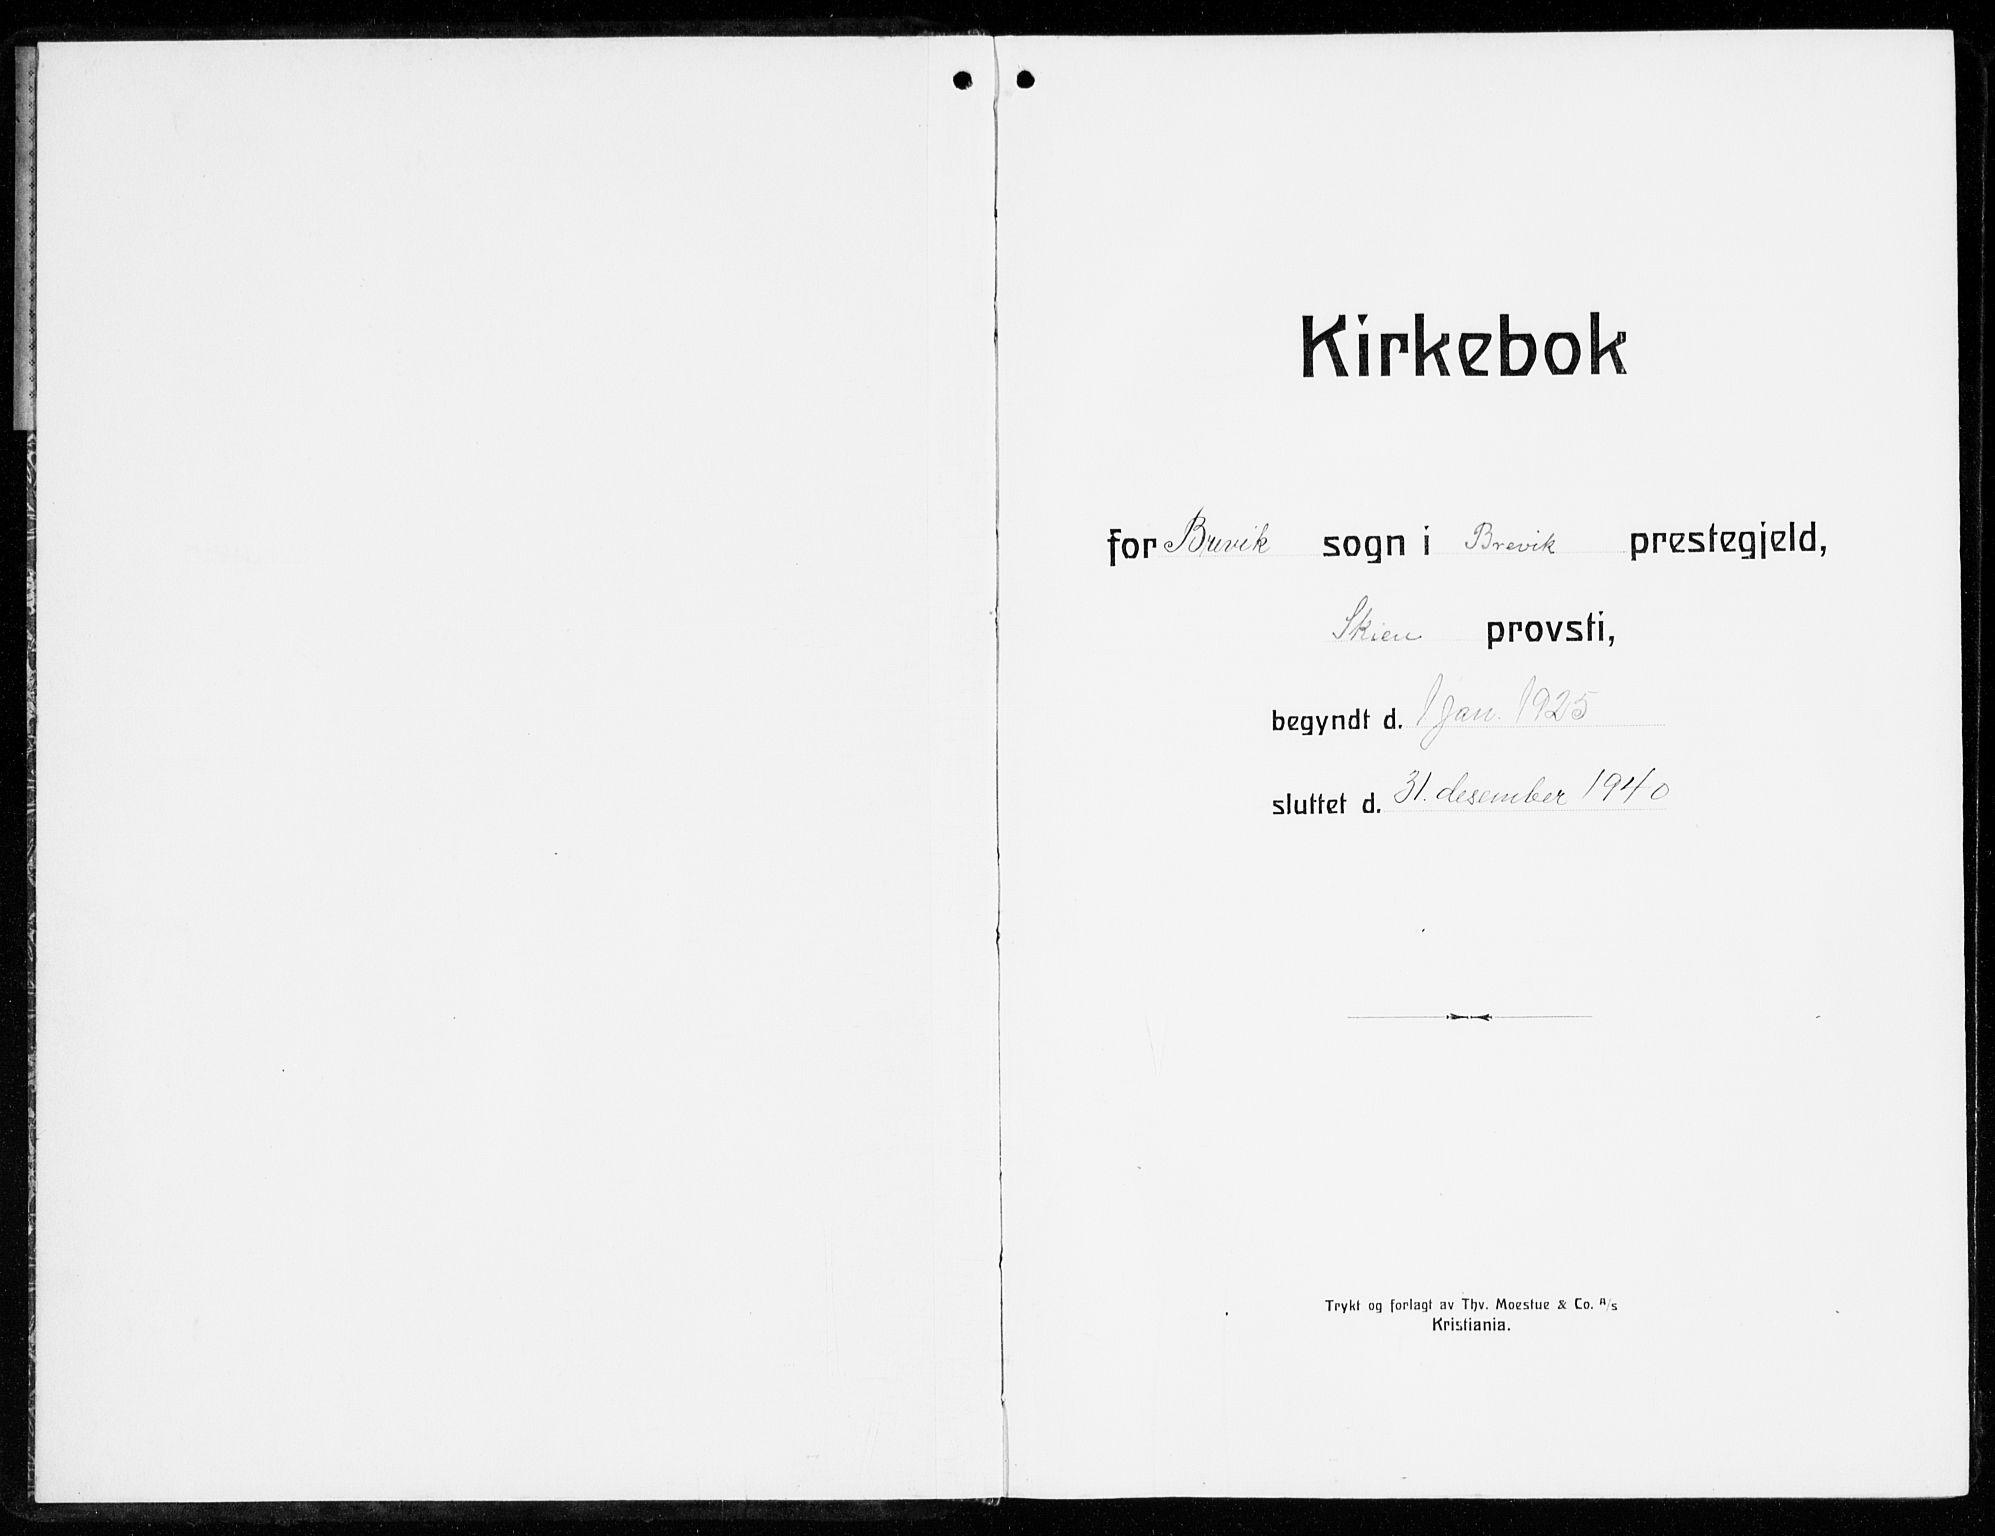 SAKO, Brevik kirkebøker, G/Ga/L0006: Klokkerbok nr. 6, 1922-1940